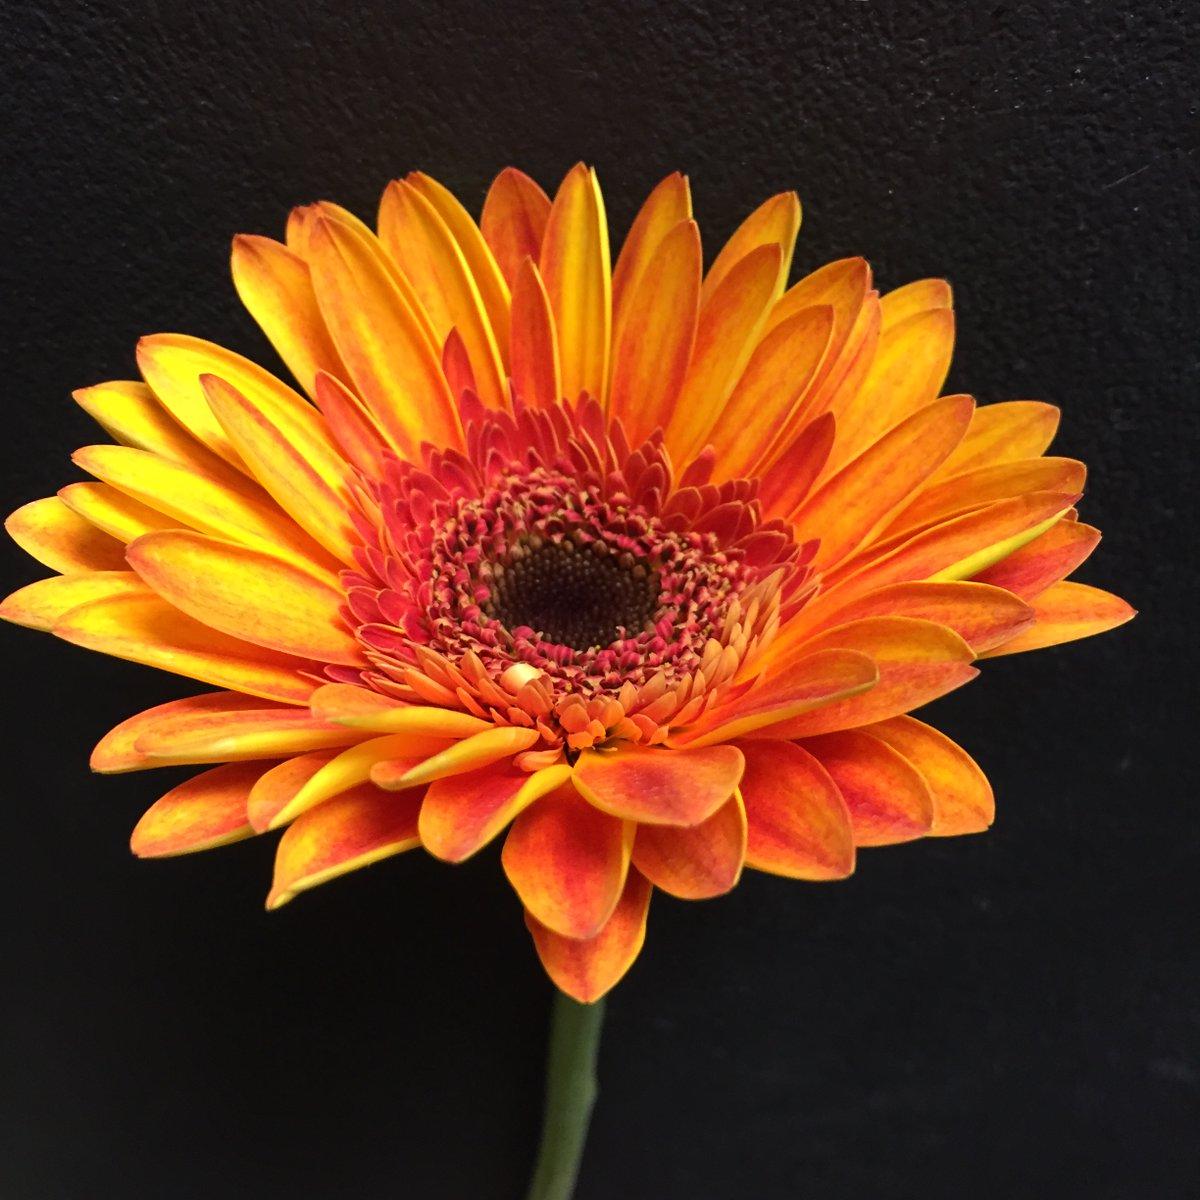 Oh so beautiful! 🧡 . . #steinflorist #steinyourflorist #flowers #florist #flowershop #floristry #shopsmall #shoplocal #smallbusiness #gerberadaisy #gerbera #daisy